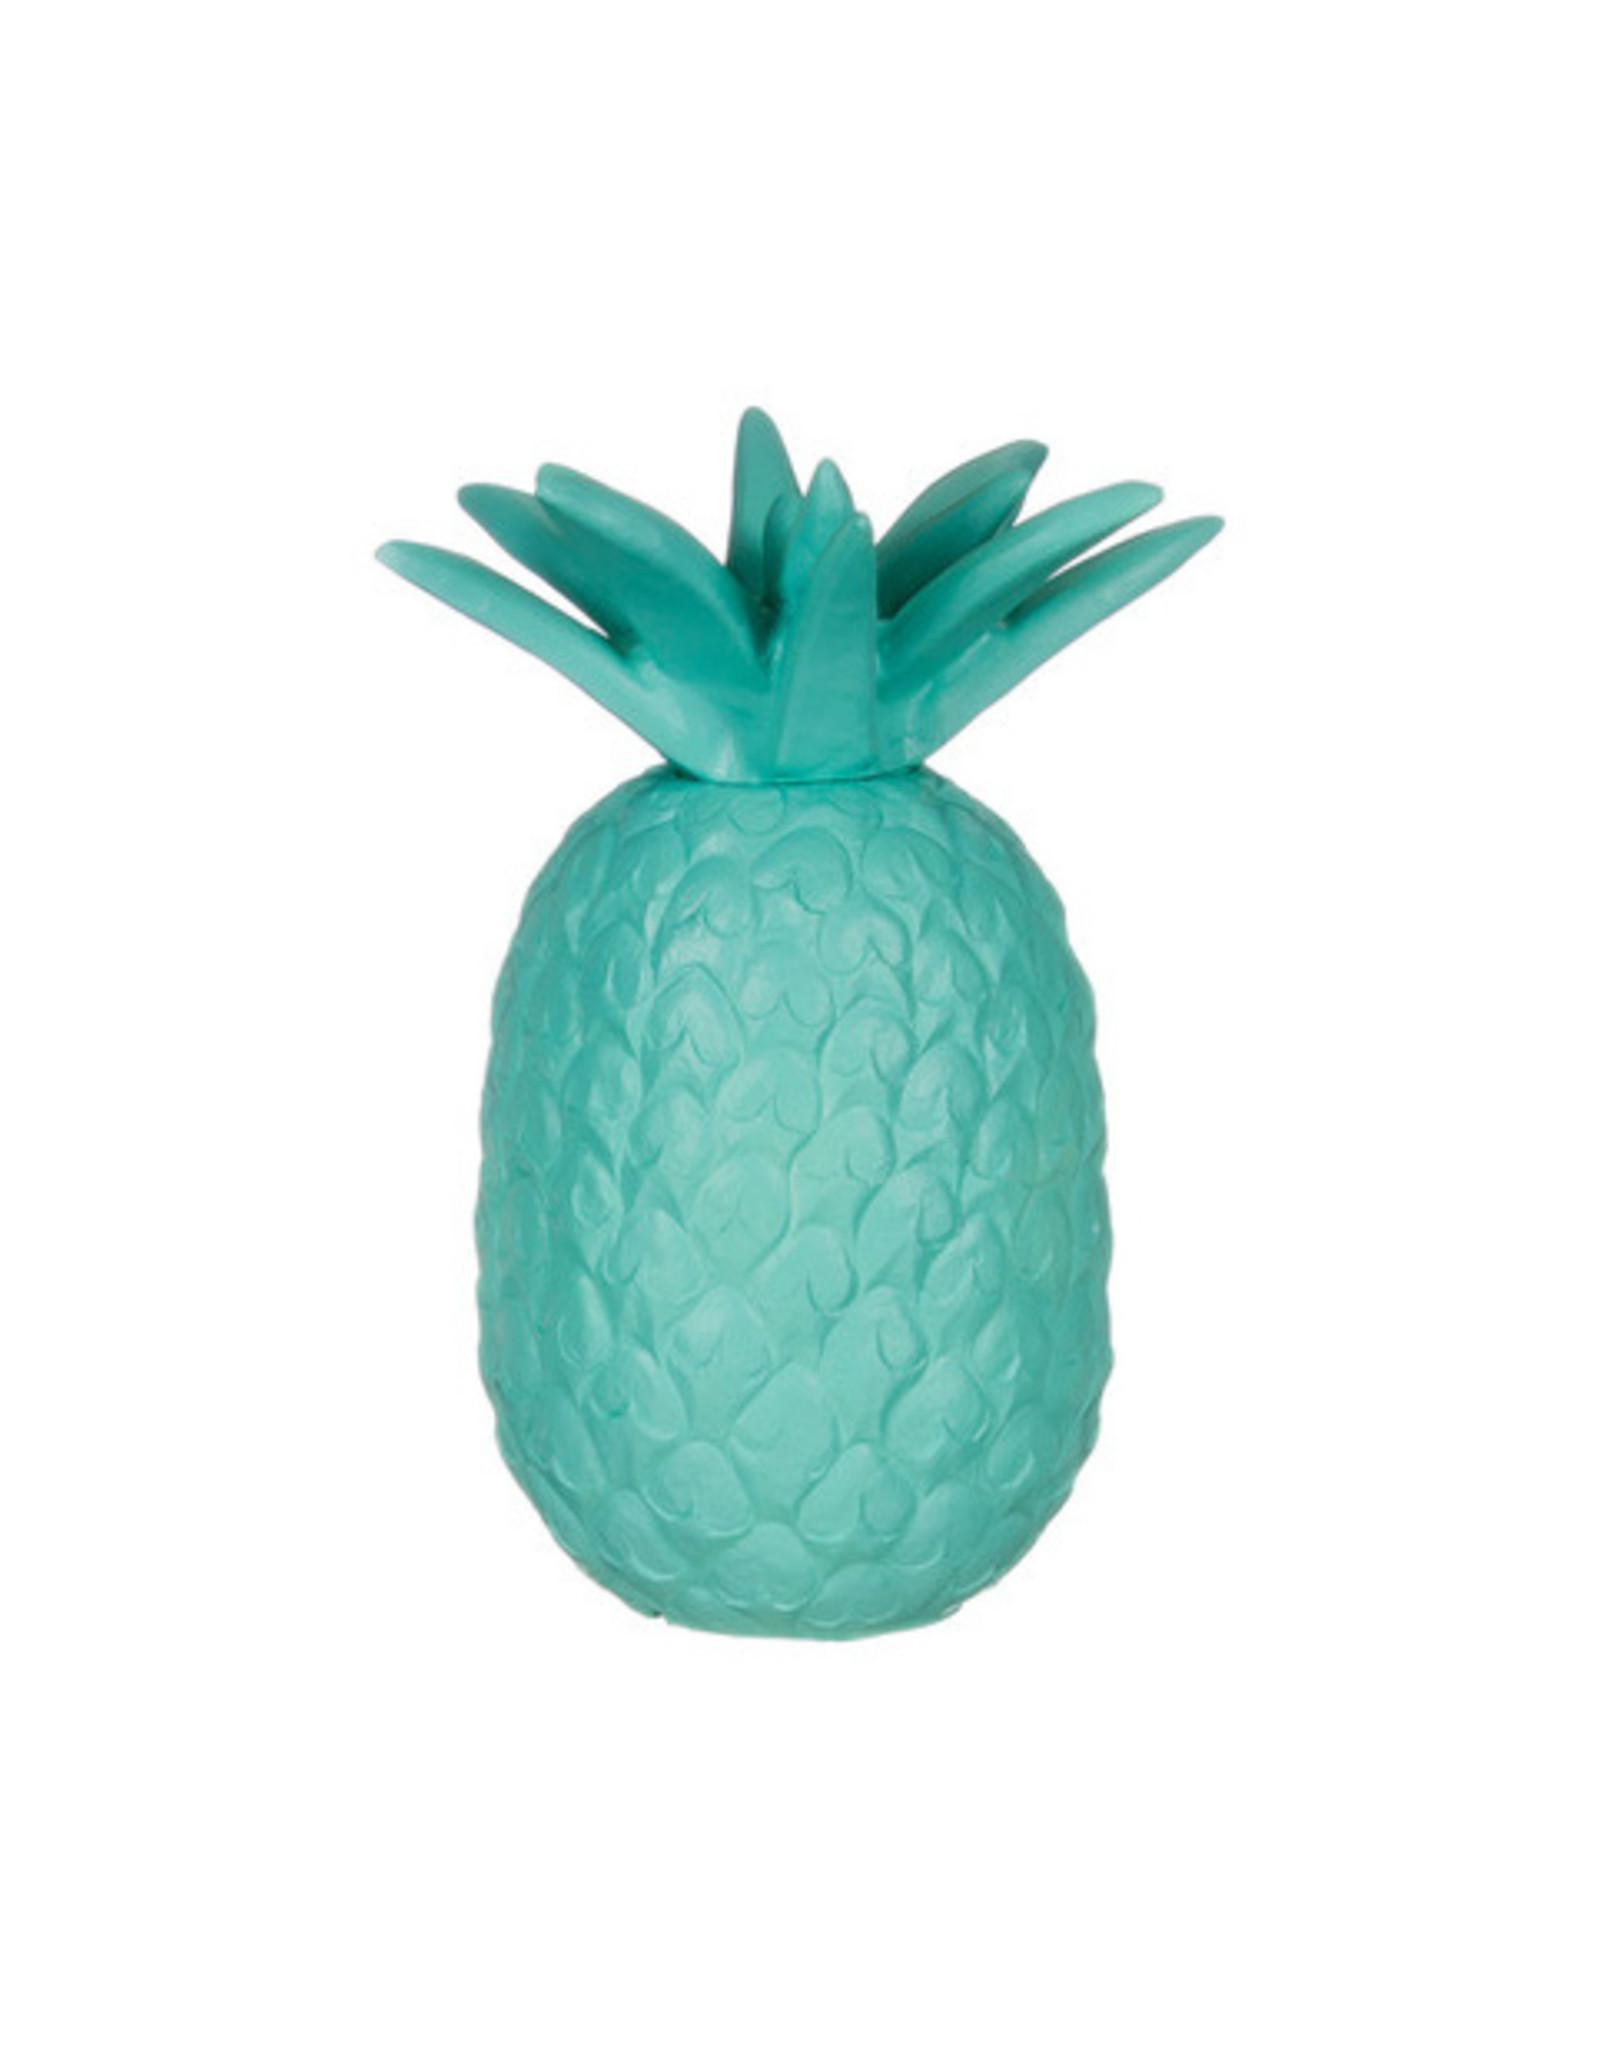 Heico Heico Turquoise Ananas Lamp